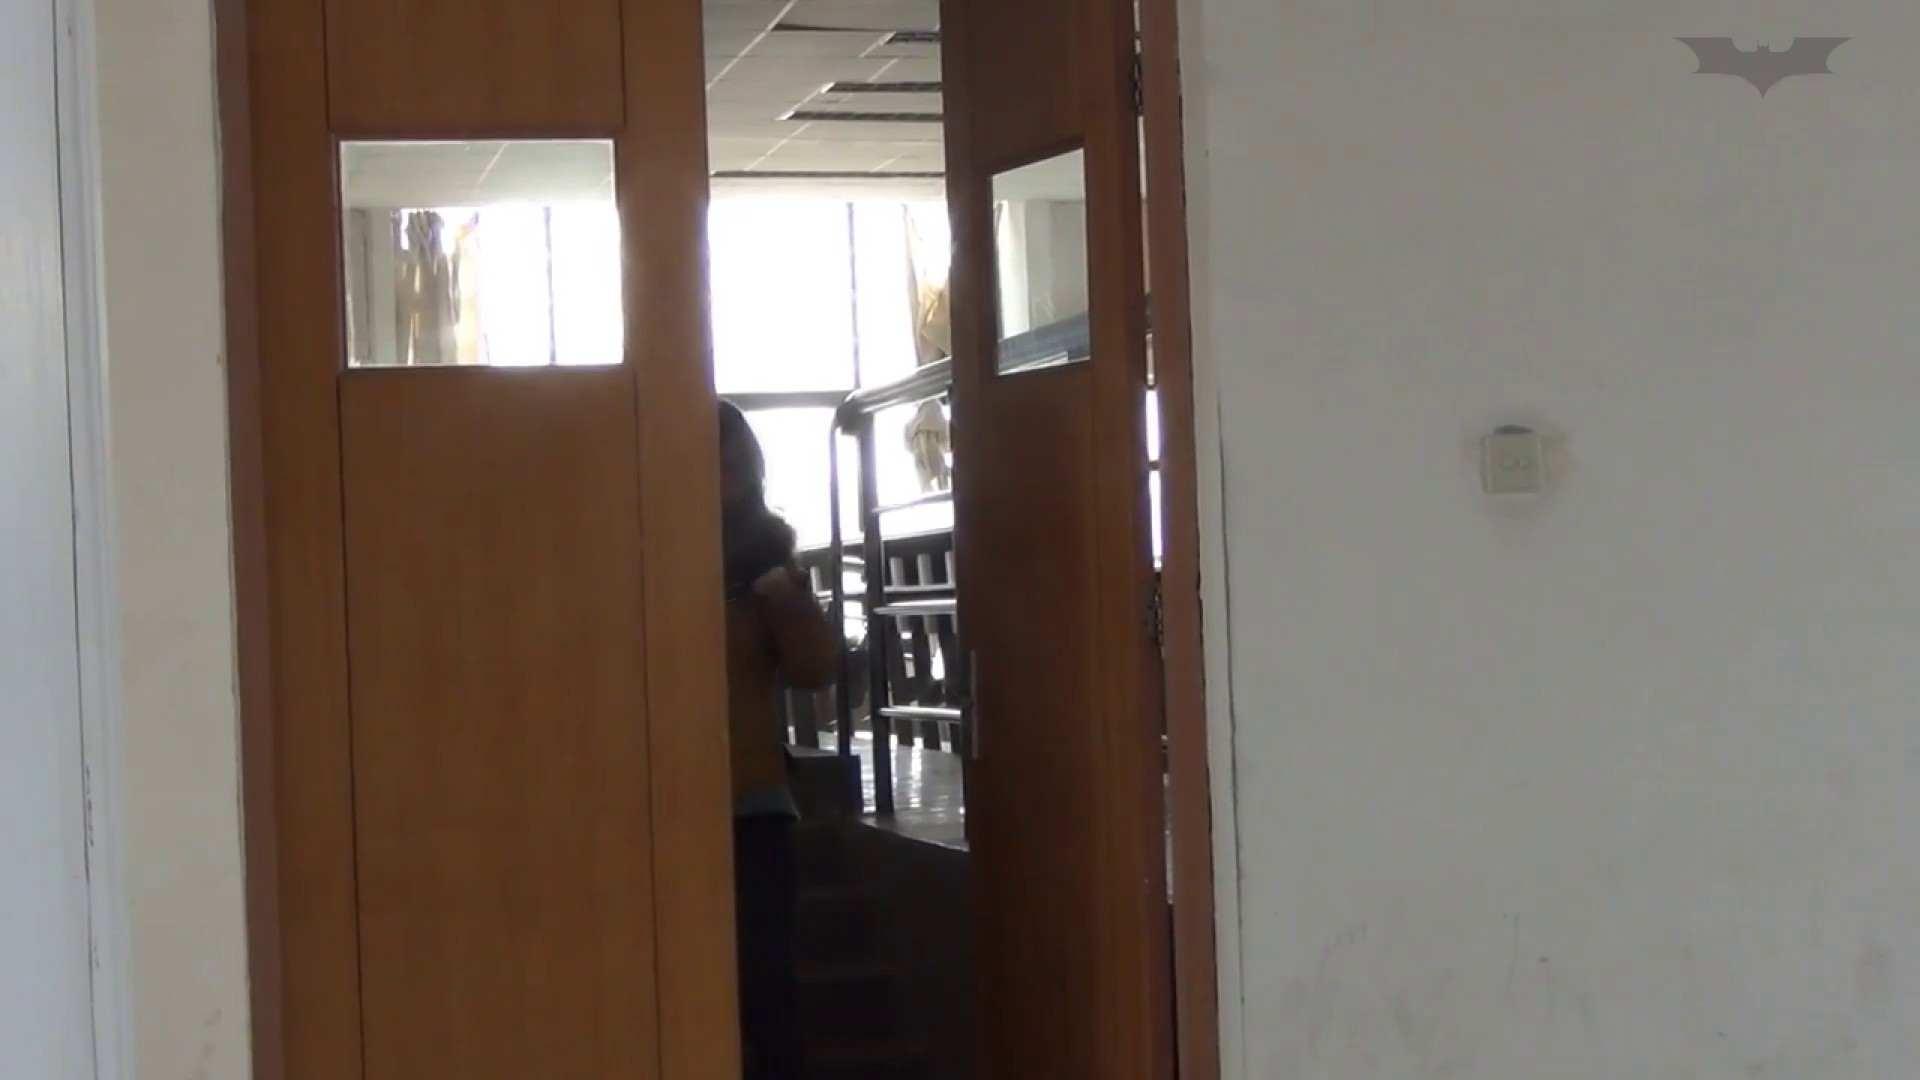 JD盗撮 美女の洗面所の秘密 Vol.61 高画質 アダルト動画キャプチャ 108画像 87